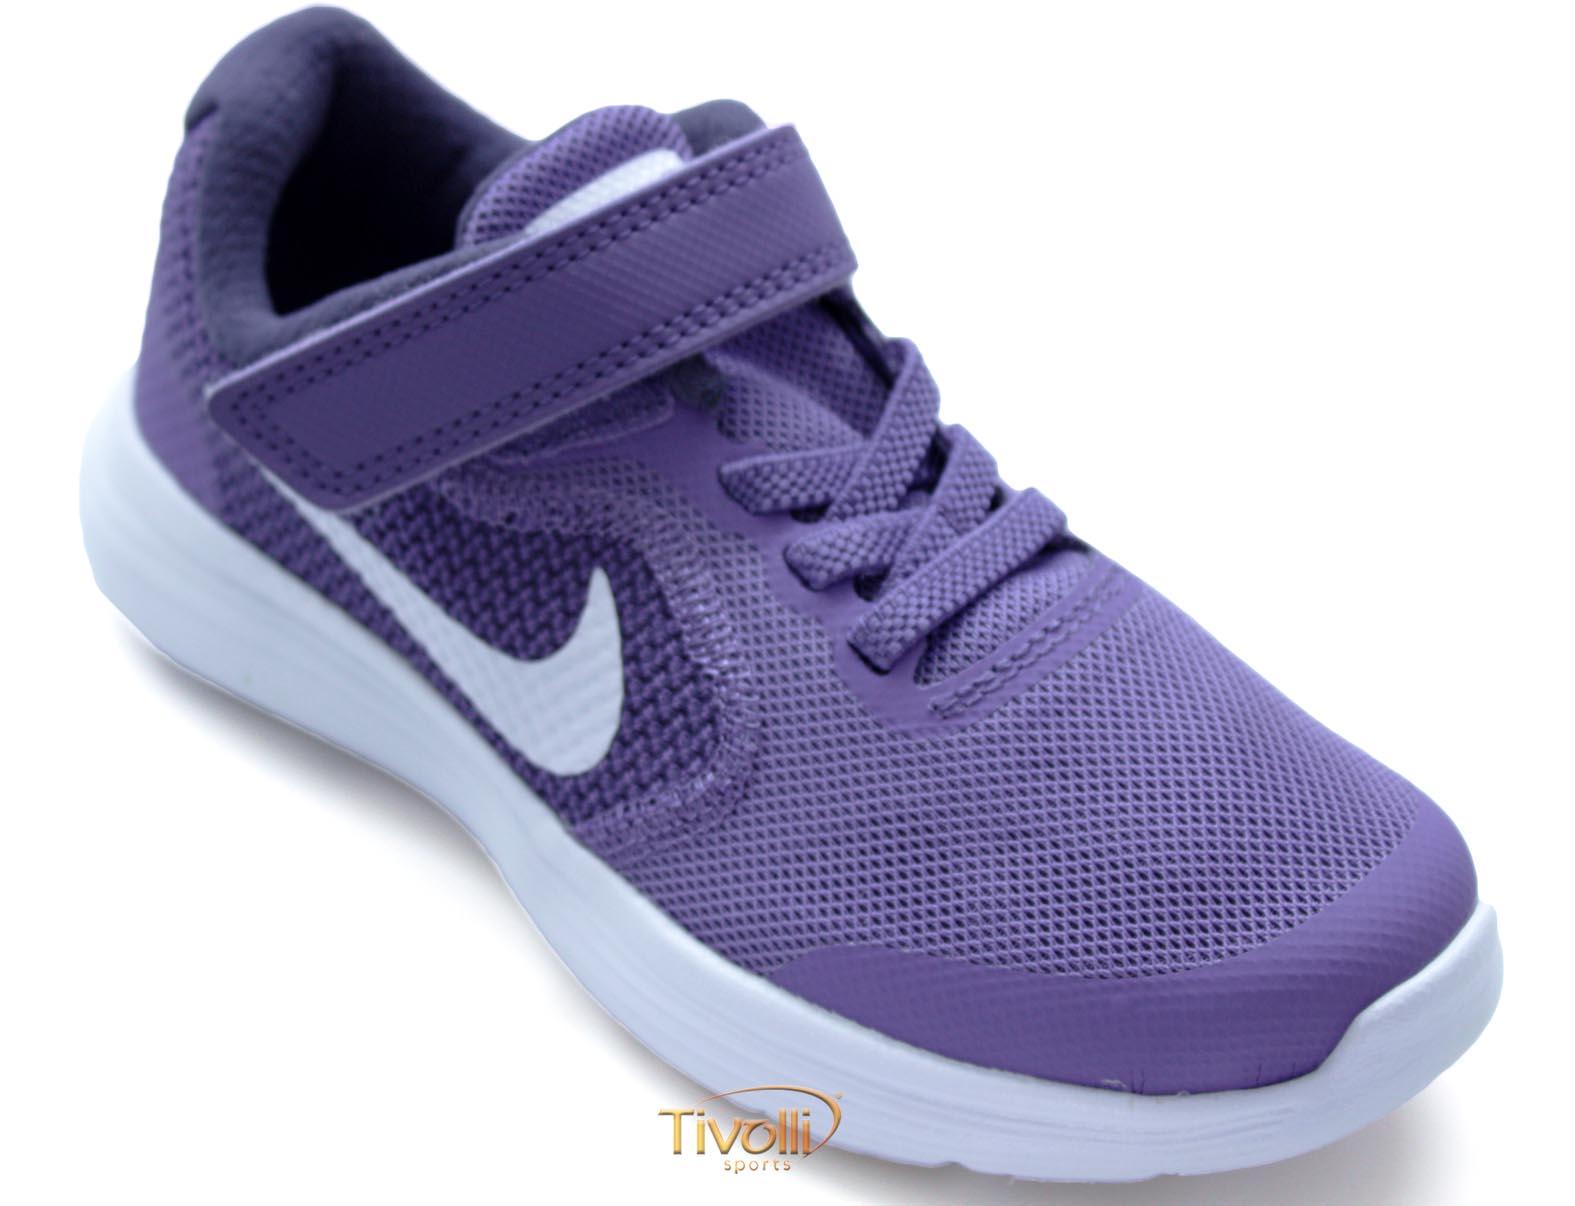 a452cae785 Tênis infantil Nike Revolution 3 (PSV)   tam. 27 ao 33